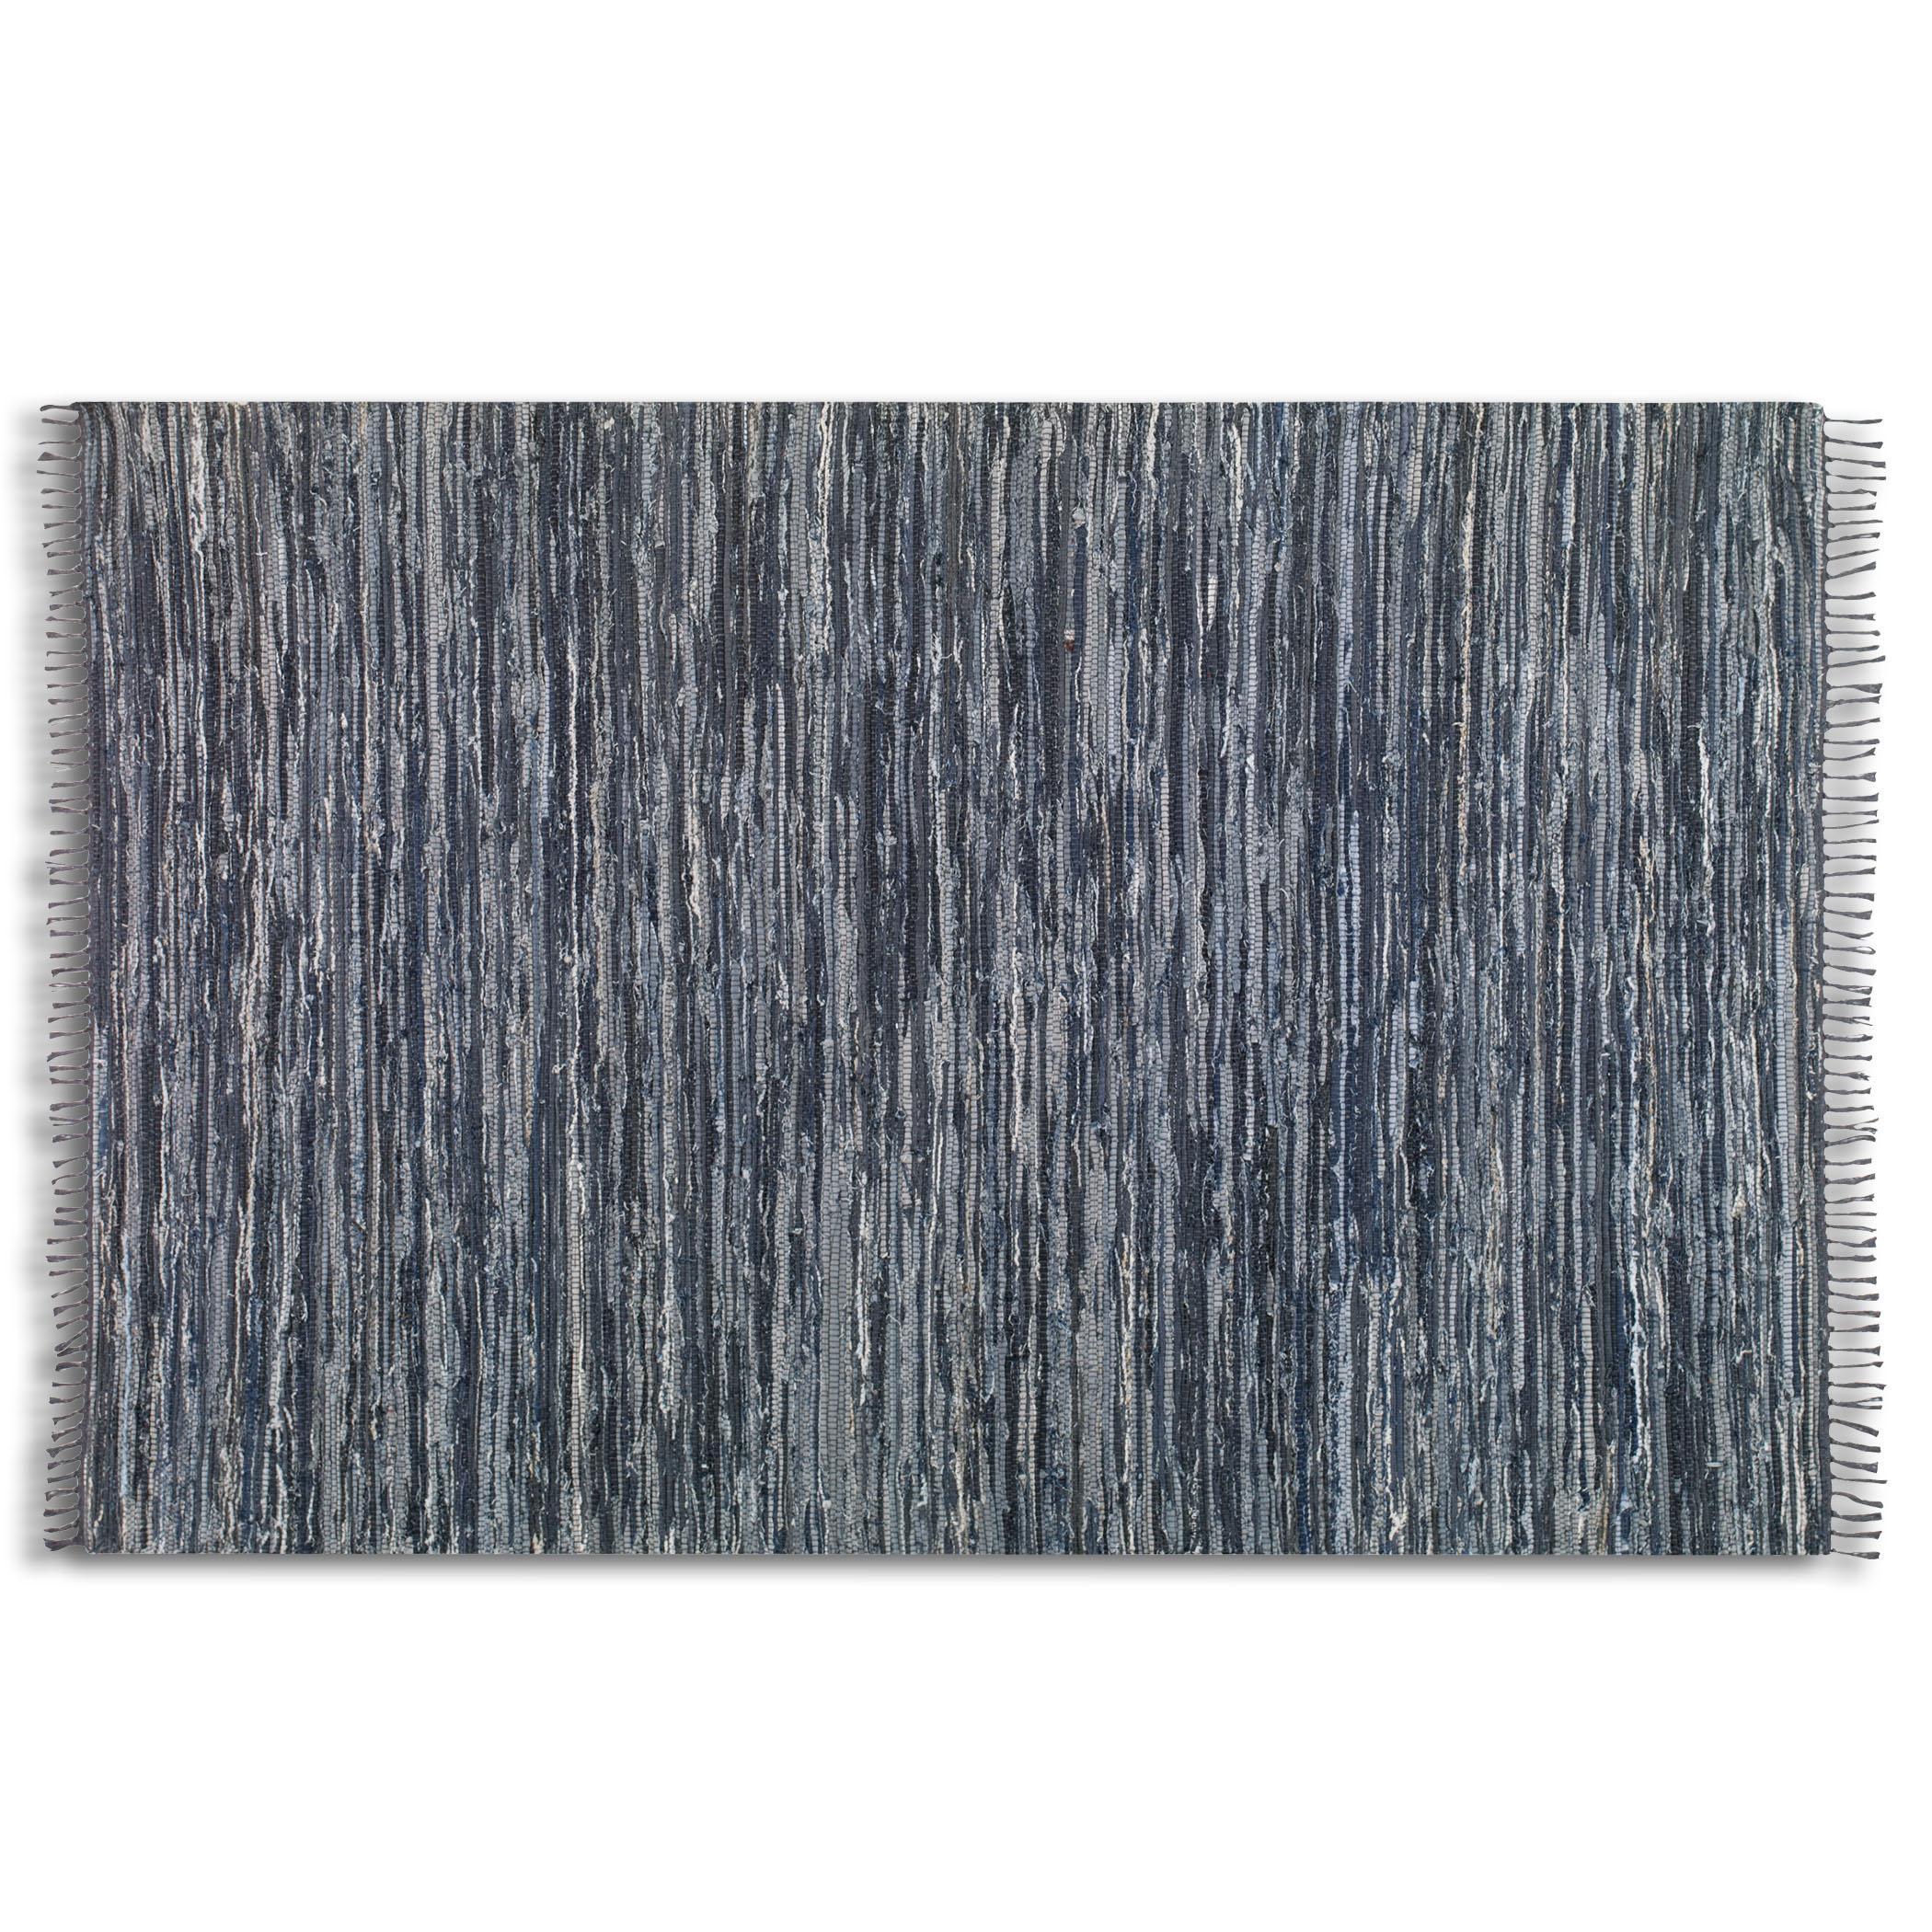 Uttermost Rugs Stockton 8 X 10 Rug - Black - Item Number: 71058-8